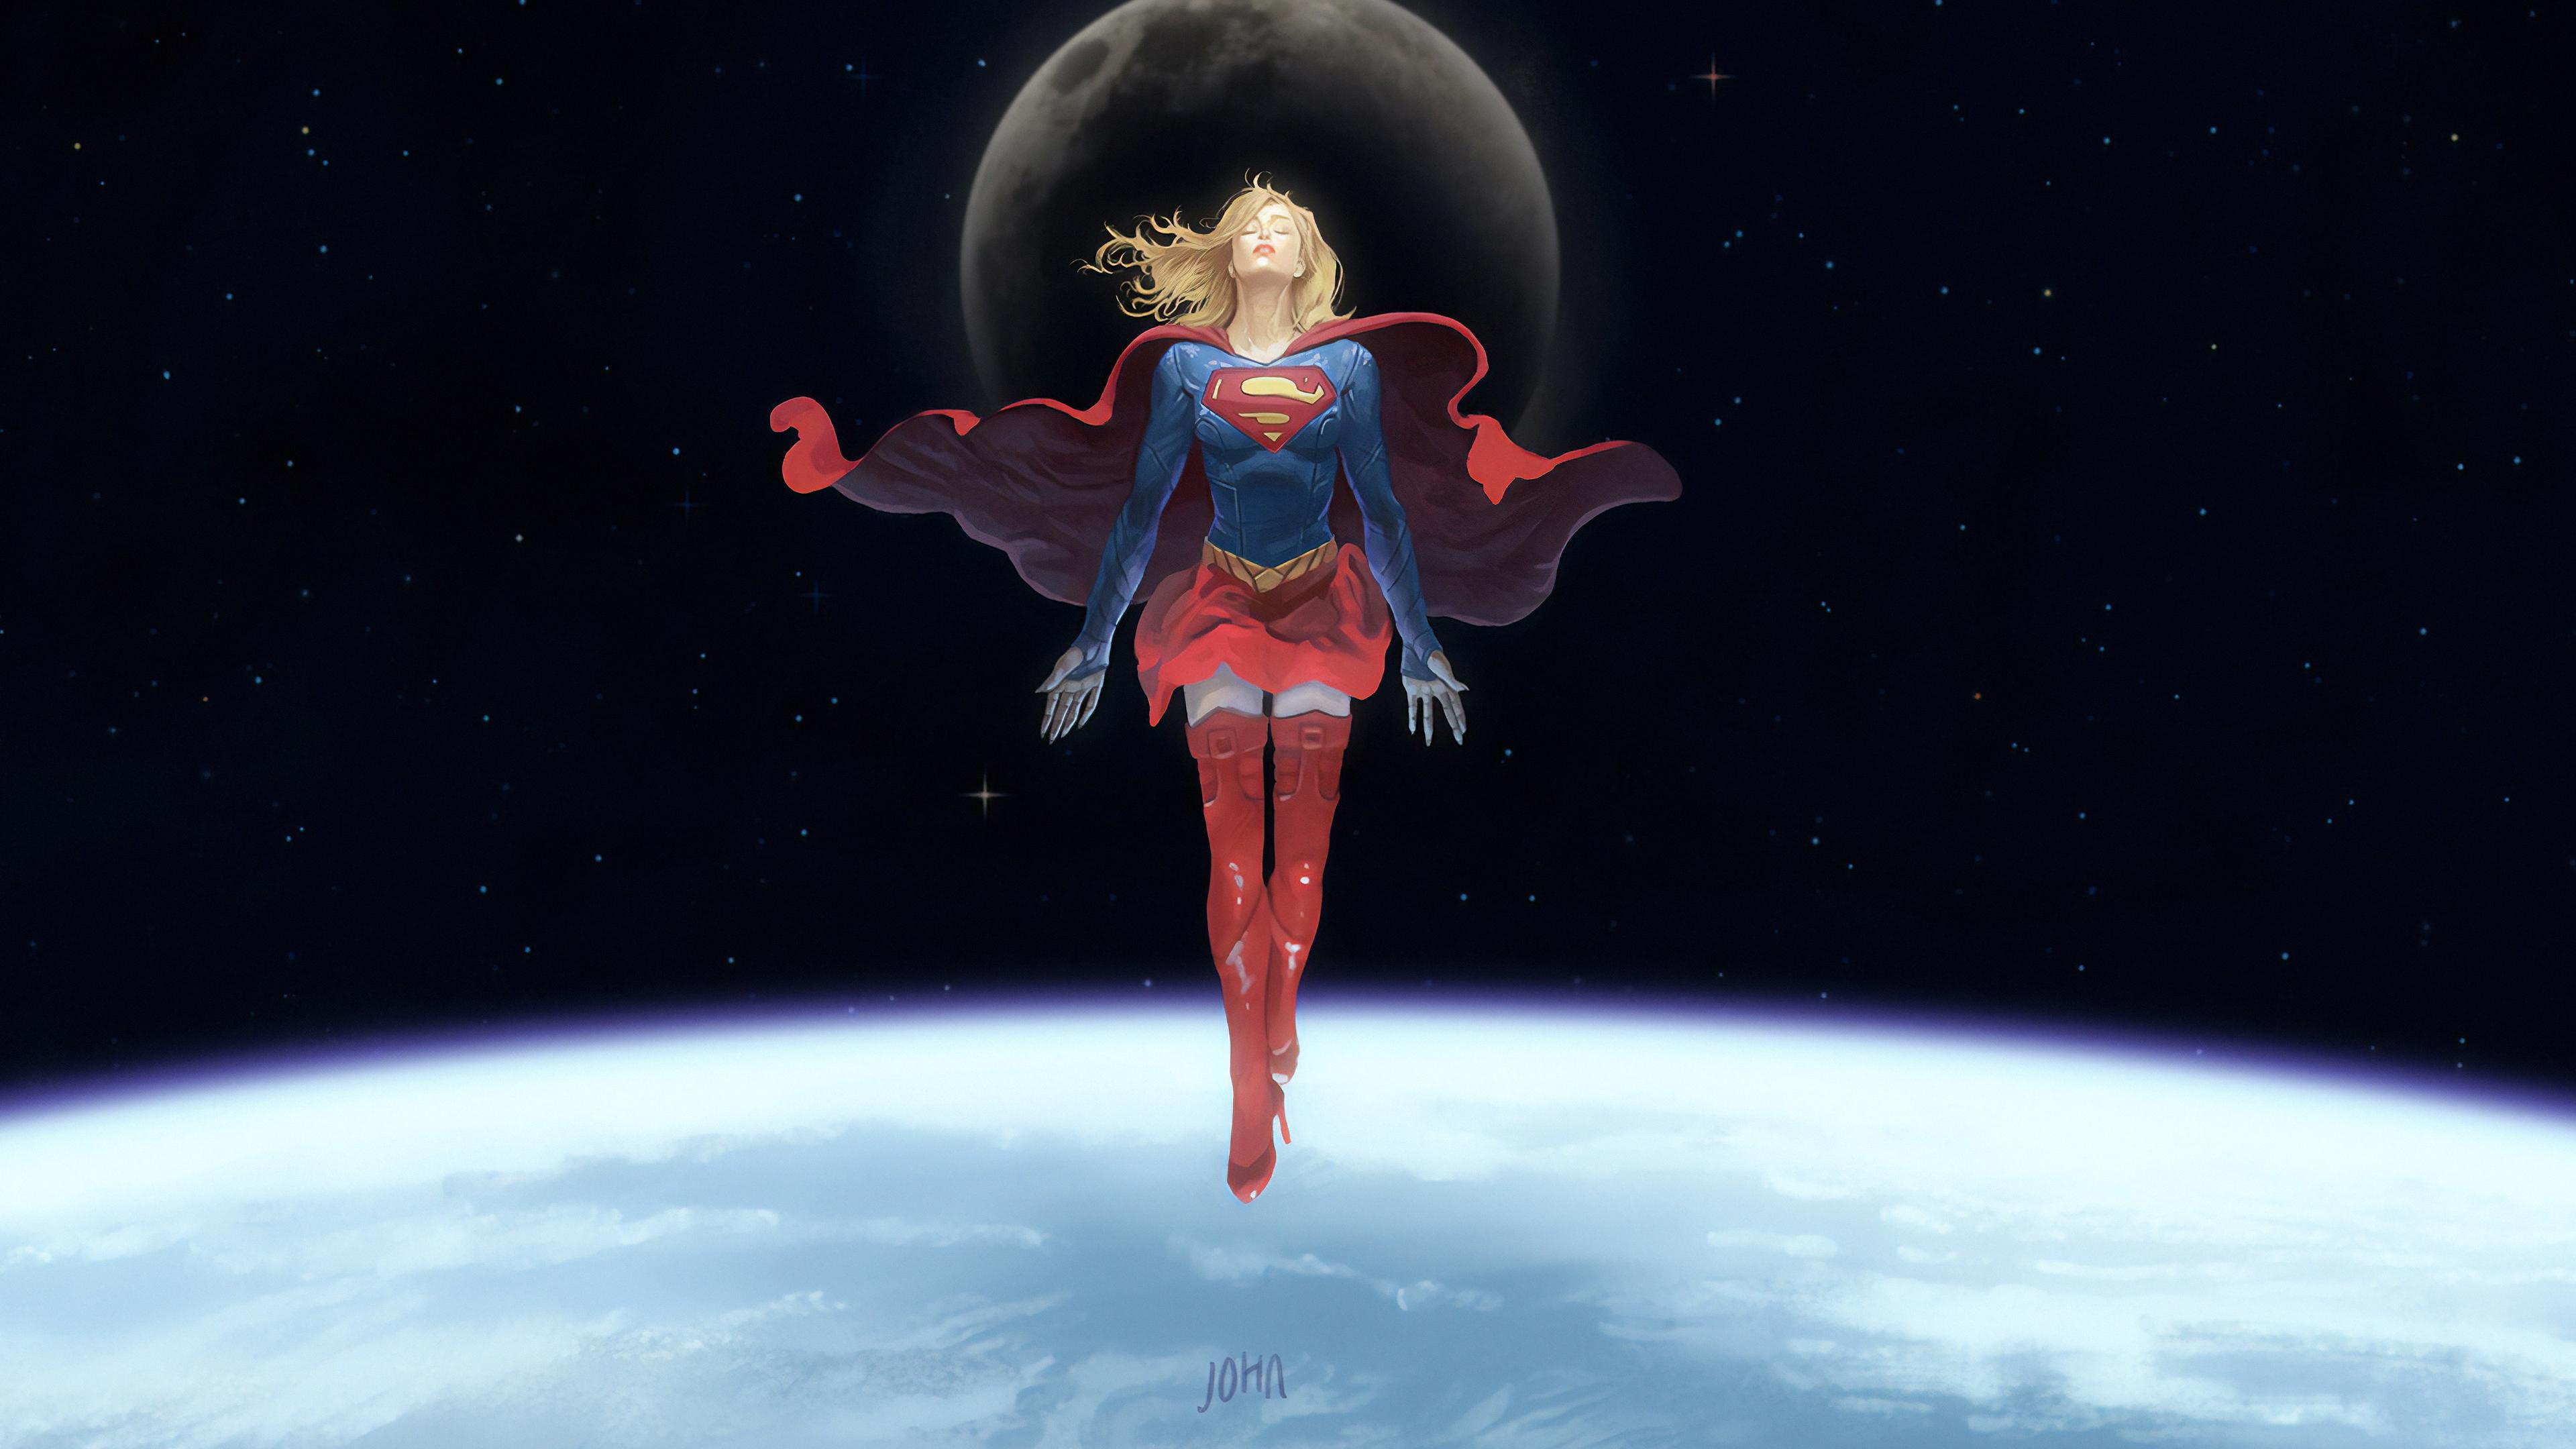 supergirl art new 1565053429 - Supergirl Art New - superheroes wallpapers, supergirl wallpapers, hd-wallpapers, digital art wallpapers, artwork wallpapers, artstation wallpapers, 4k-wallpapers